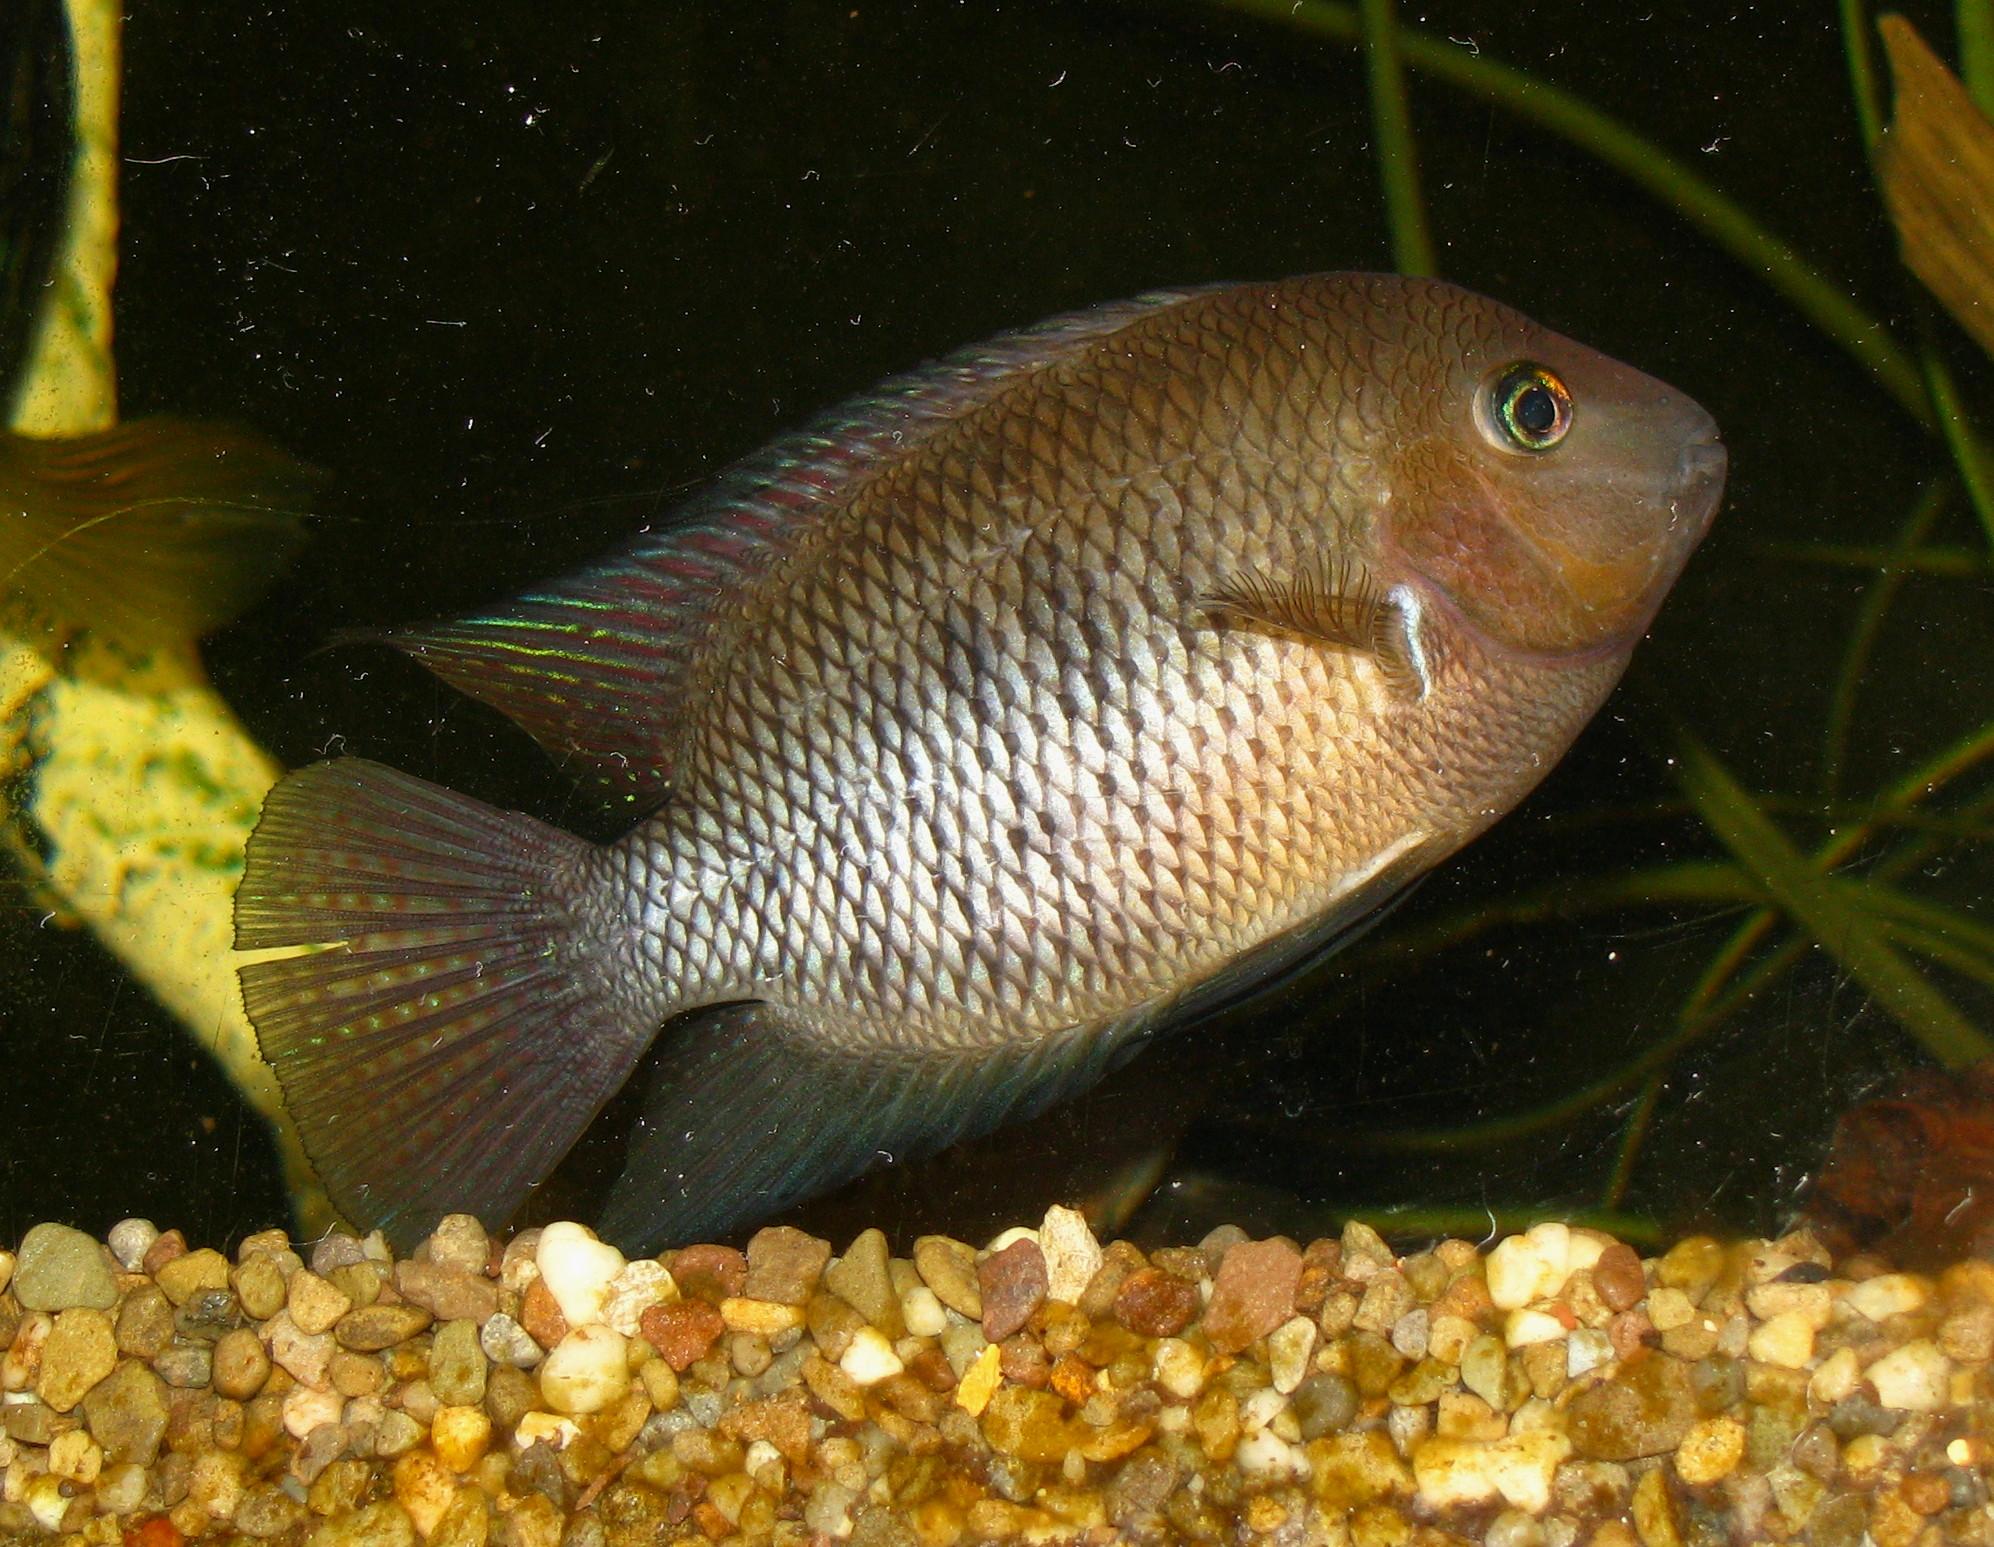 cichlids.com: blue eyed cichlid